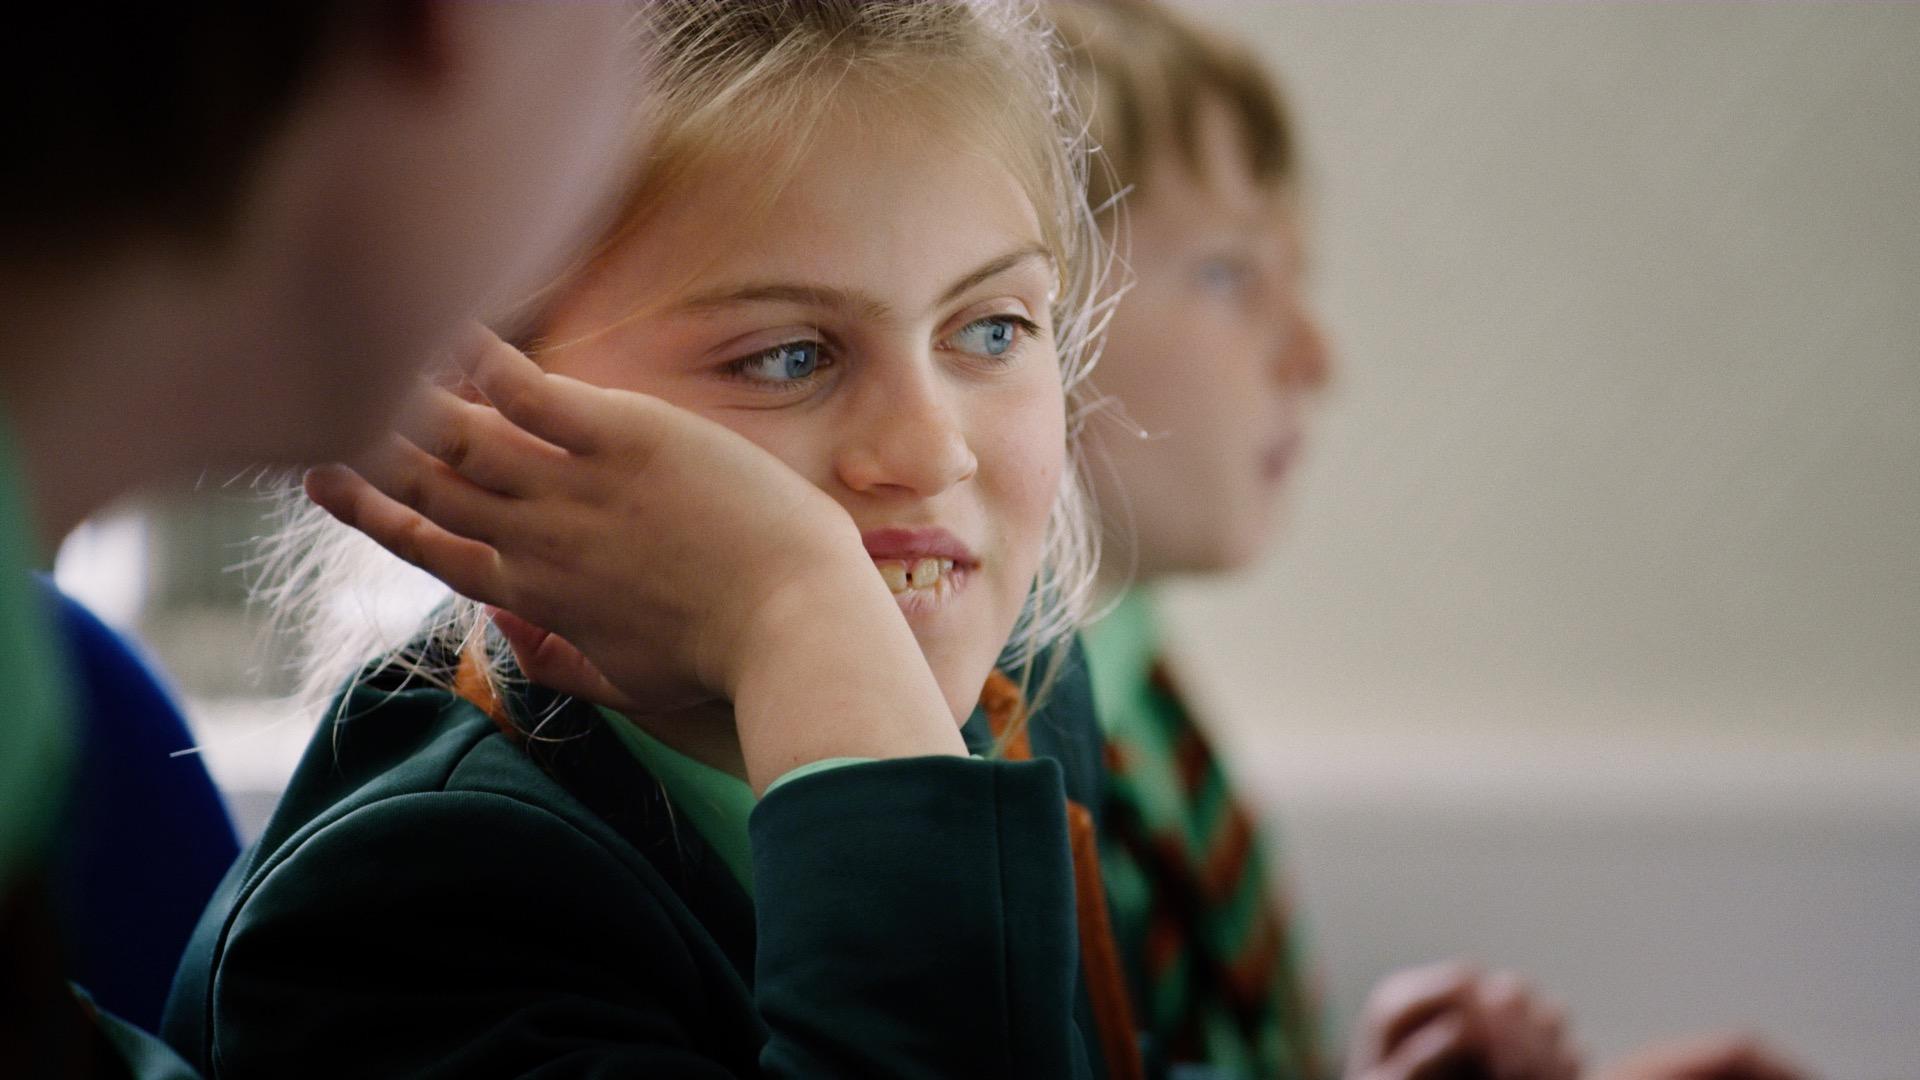 Promethean - Oakhill School / WhiteNoise Media